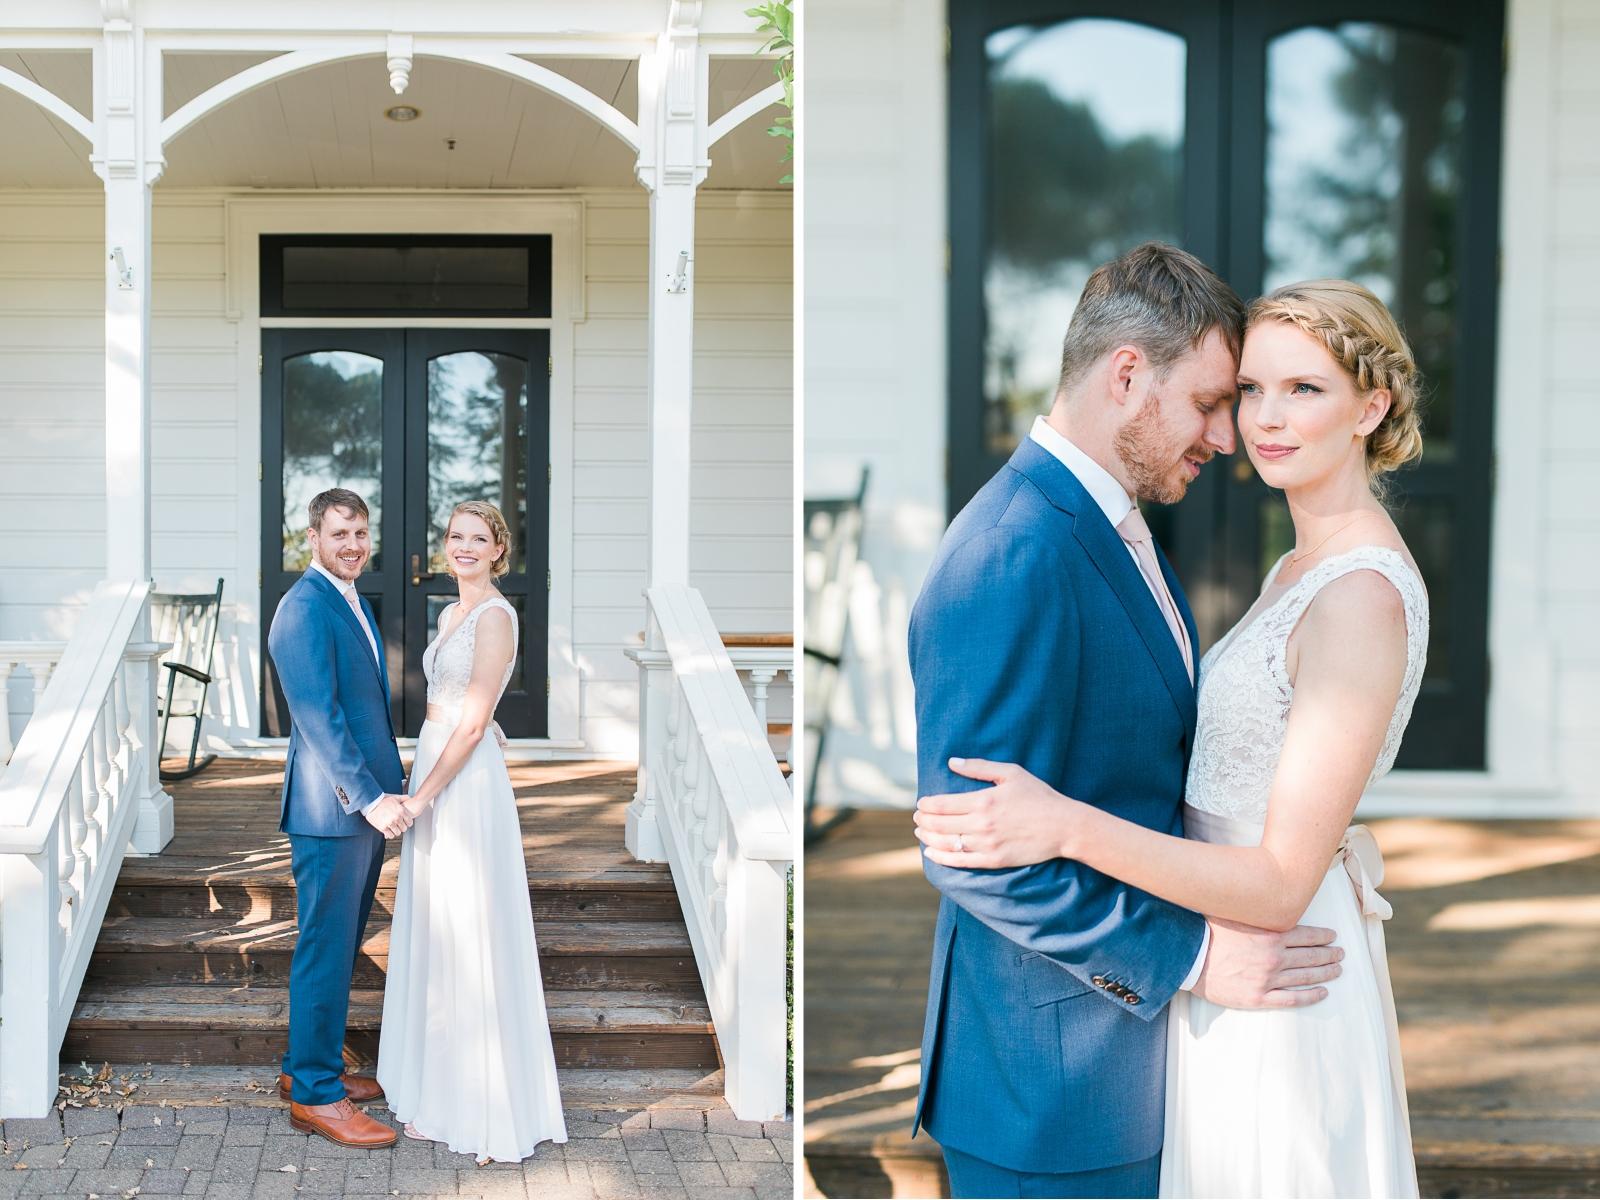 Generals Daughter Wedding Photos by JBJ Pictures - Ramekins Wedding Venue Photographer in Sonoma, Napa (10).jpg